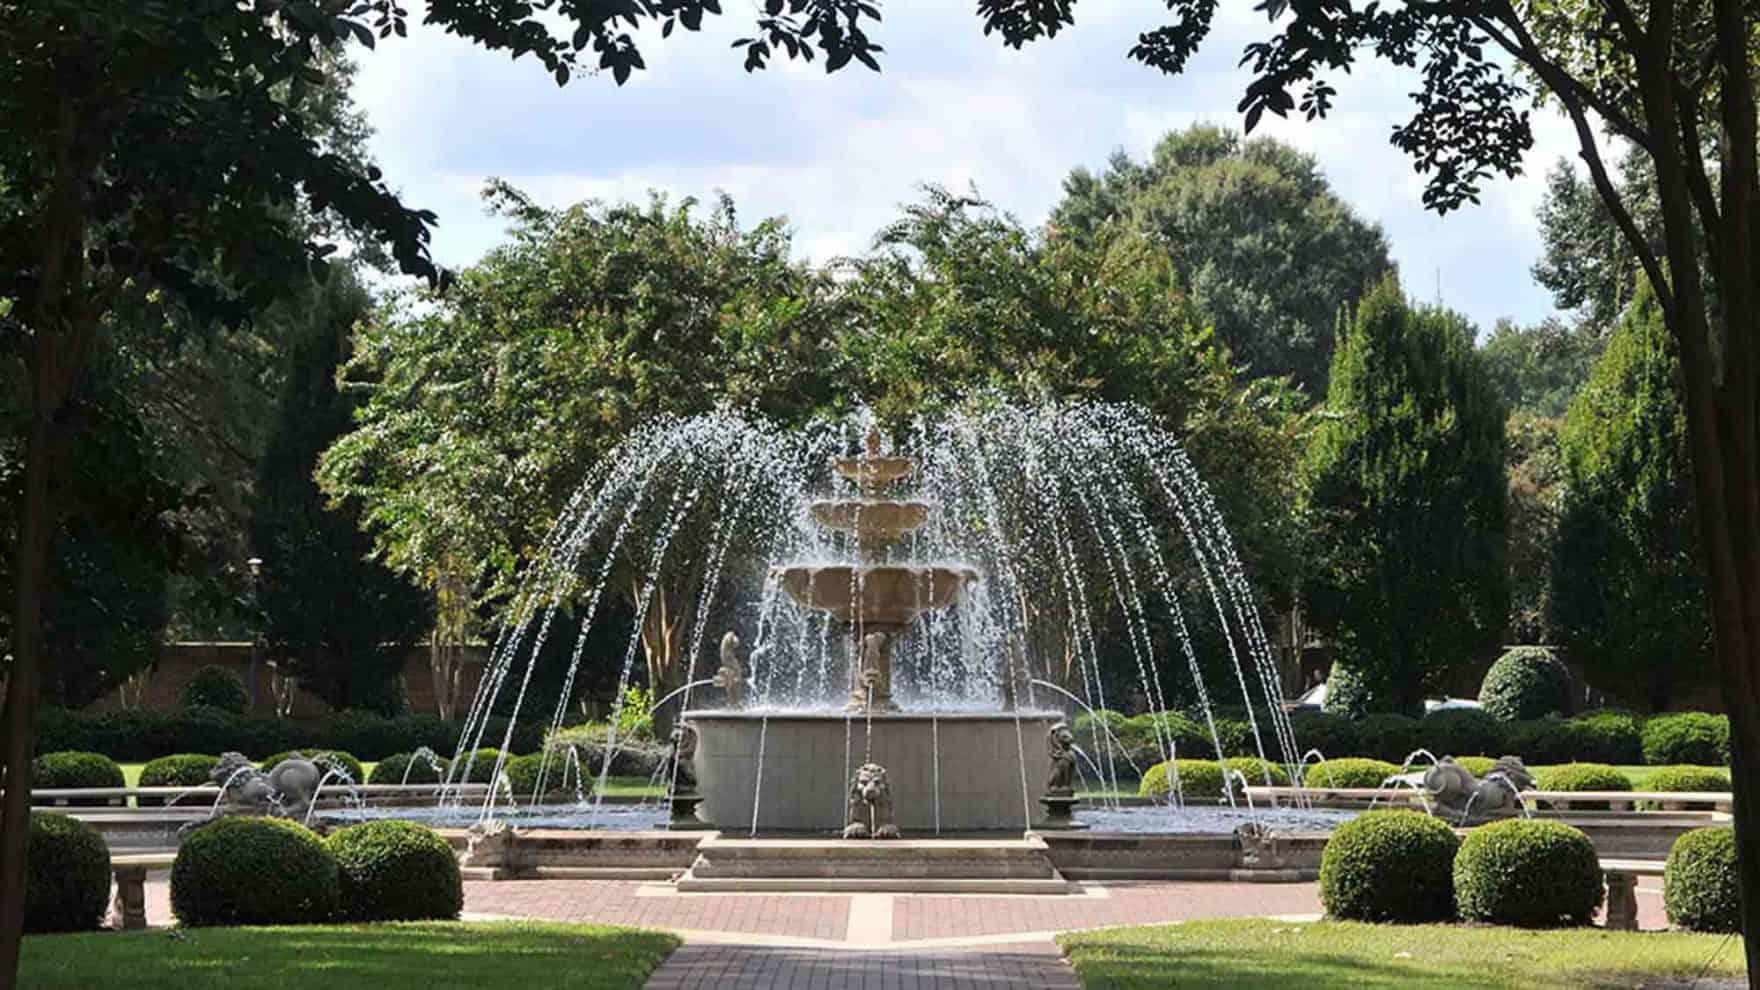 The fountain on Regent University's campus in Virginia Beach, VA 23464.